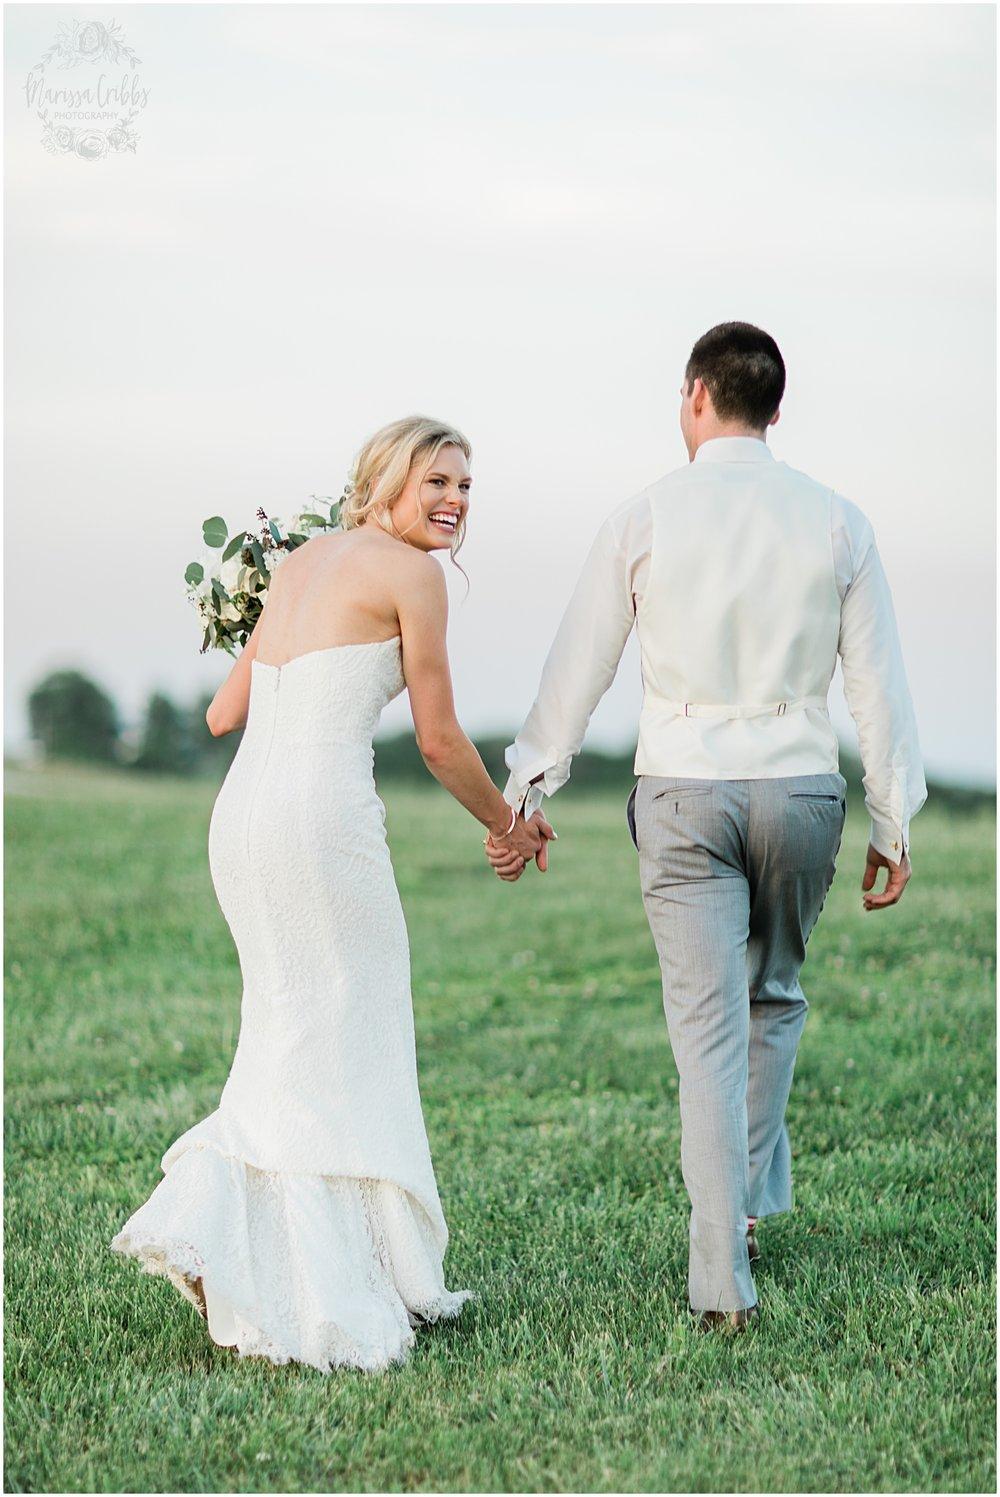 RHODES WEDDING | WESTON RED BARN FARM | MARISSA CRIBBS PHOTOGRAPHY_5329.jpg